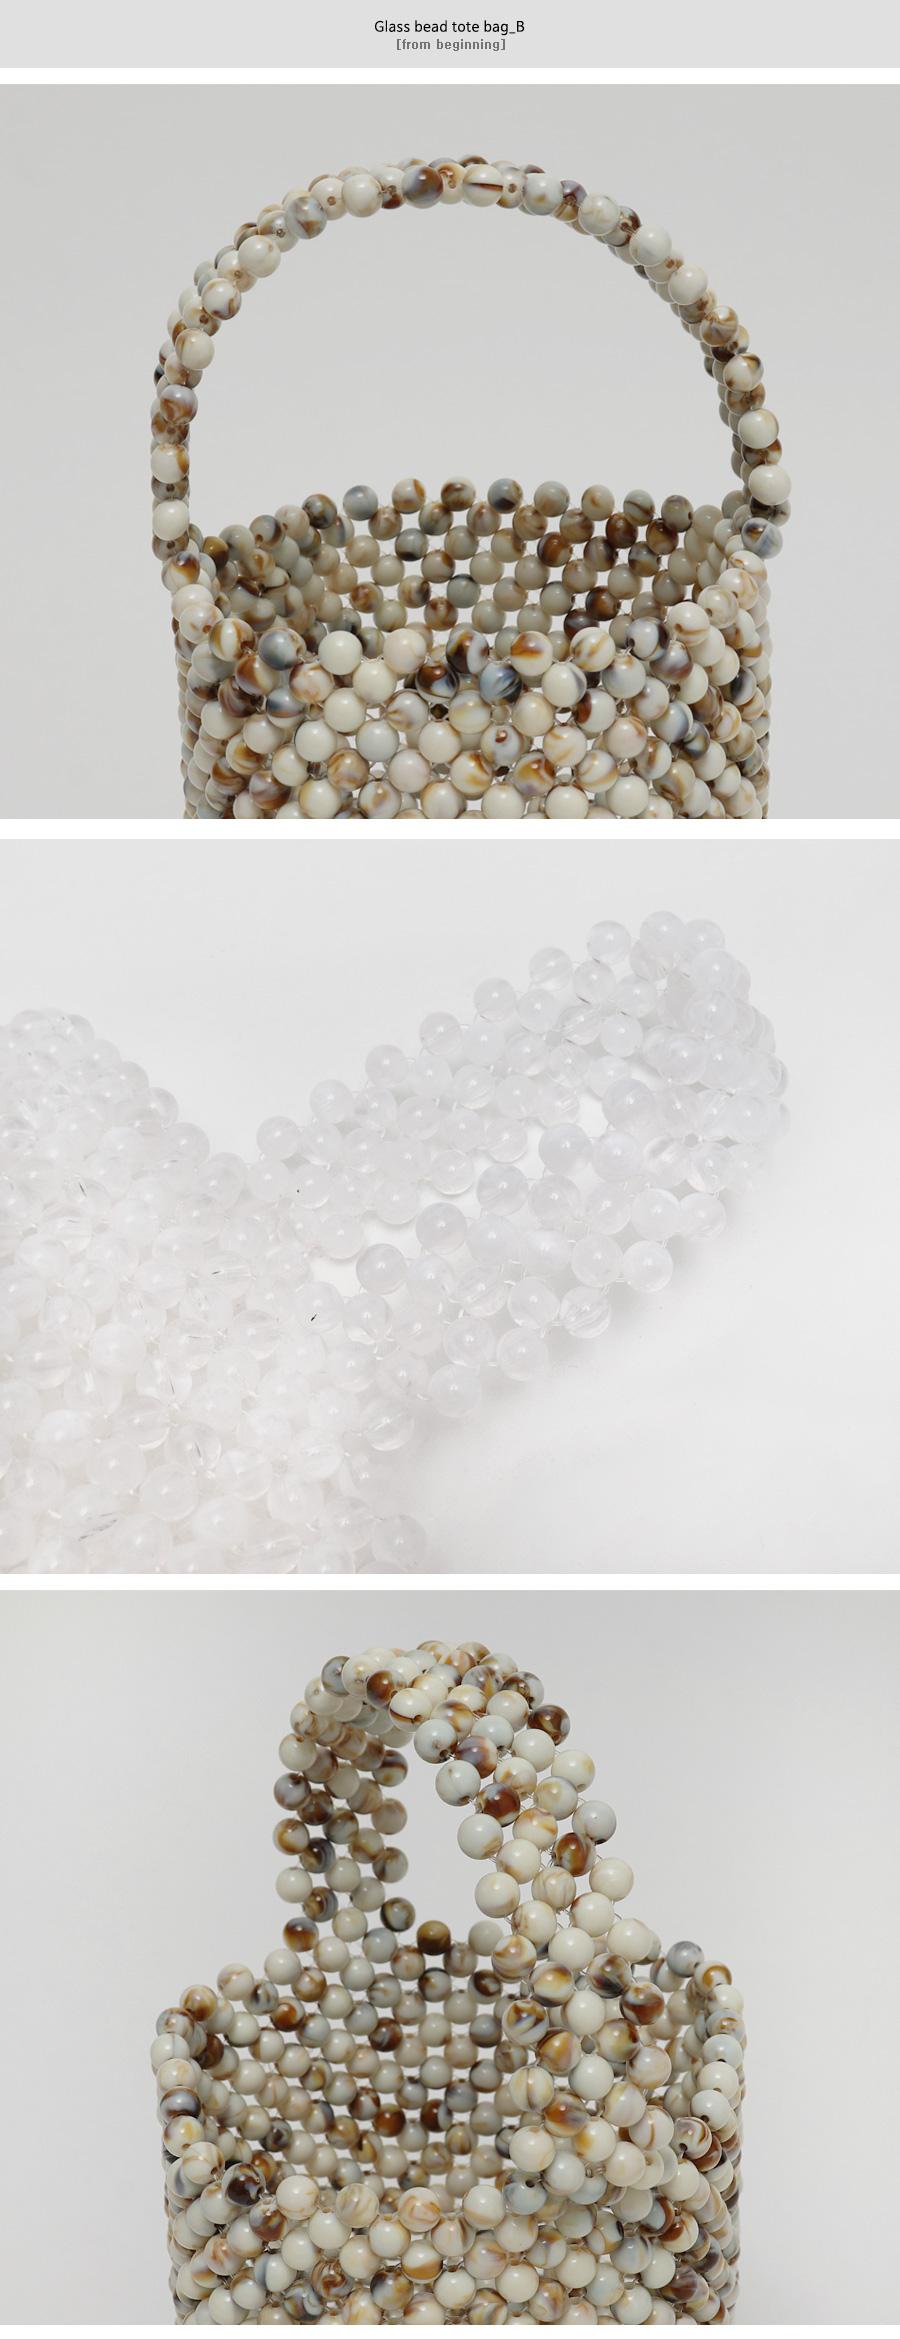 Glass bead tote bag_B